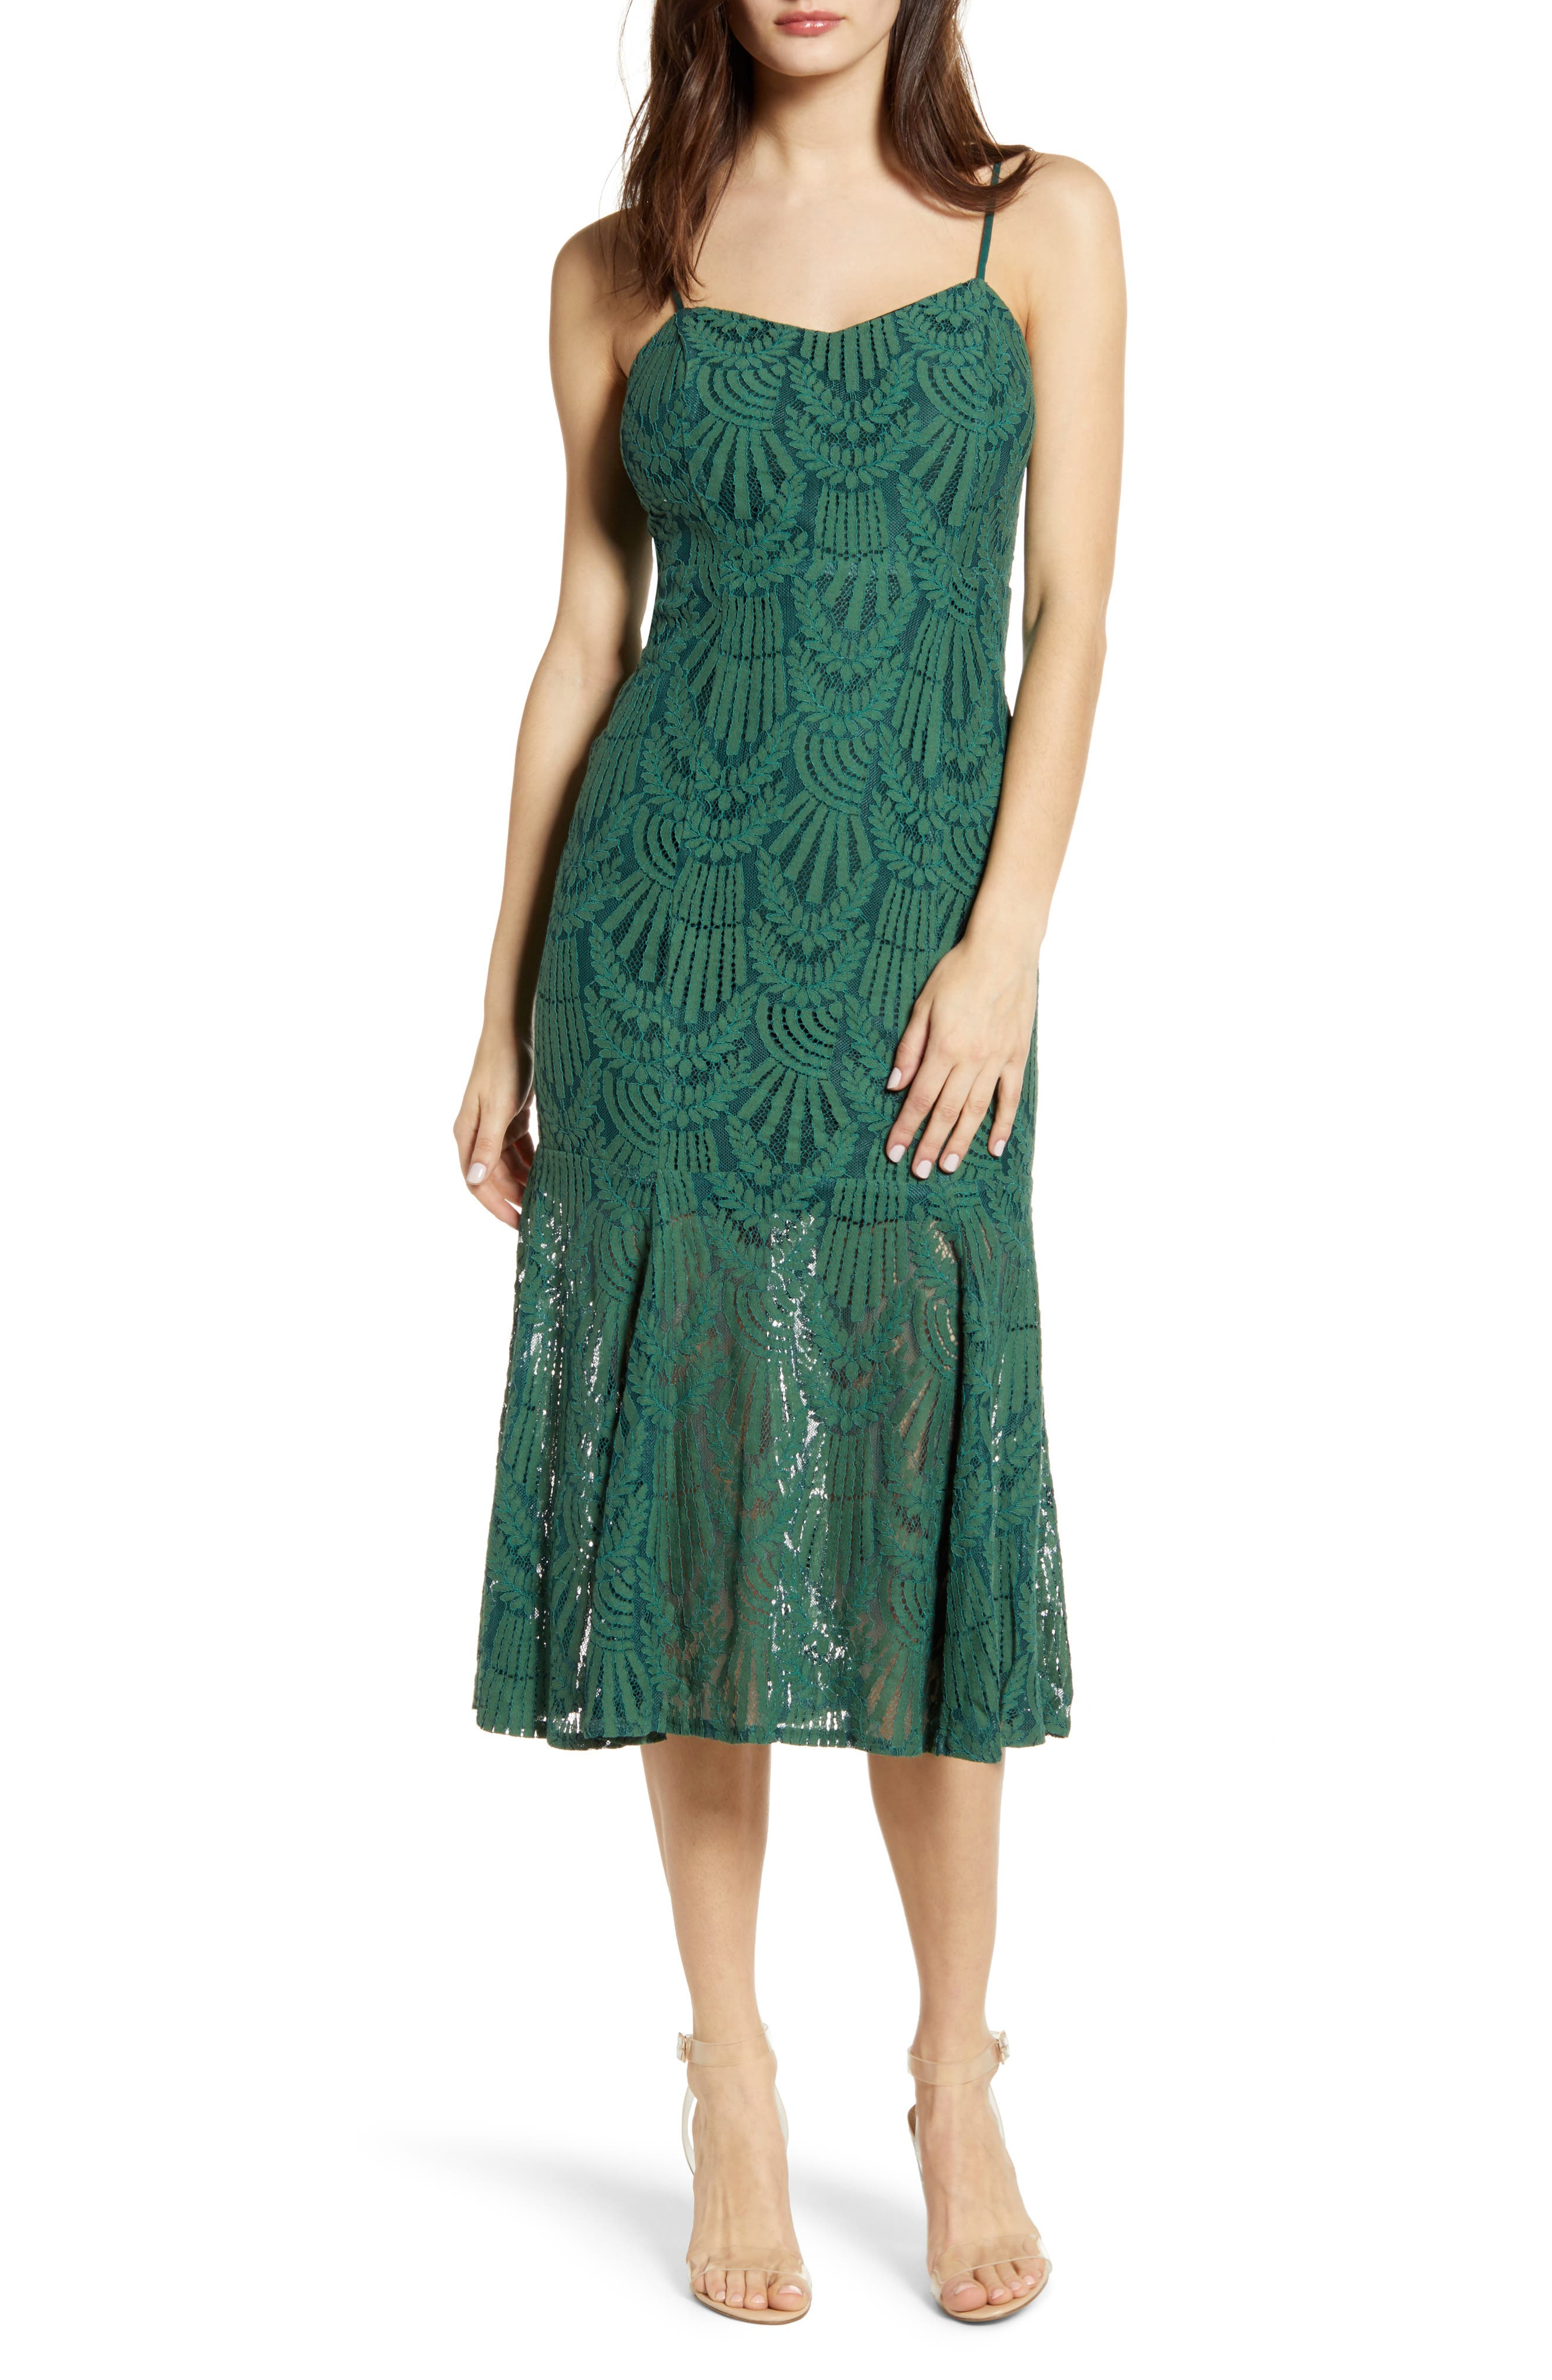 4Si3Nna Sleeveless Lace Midi Dress, Green